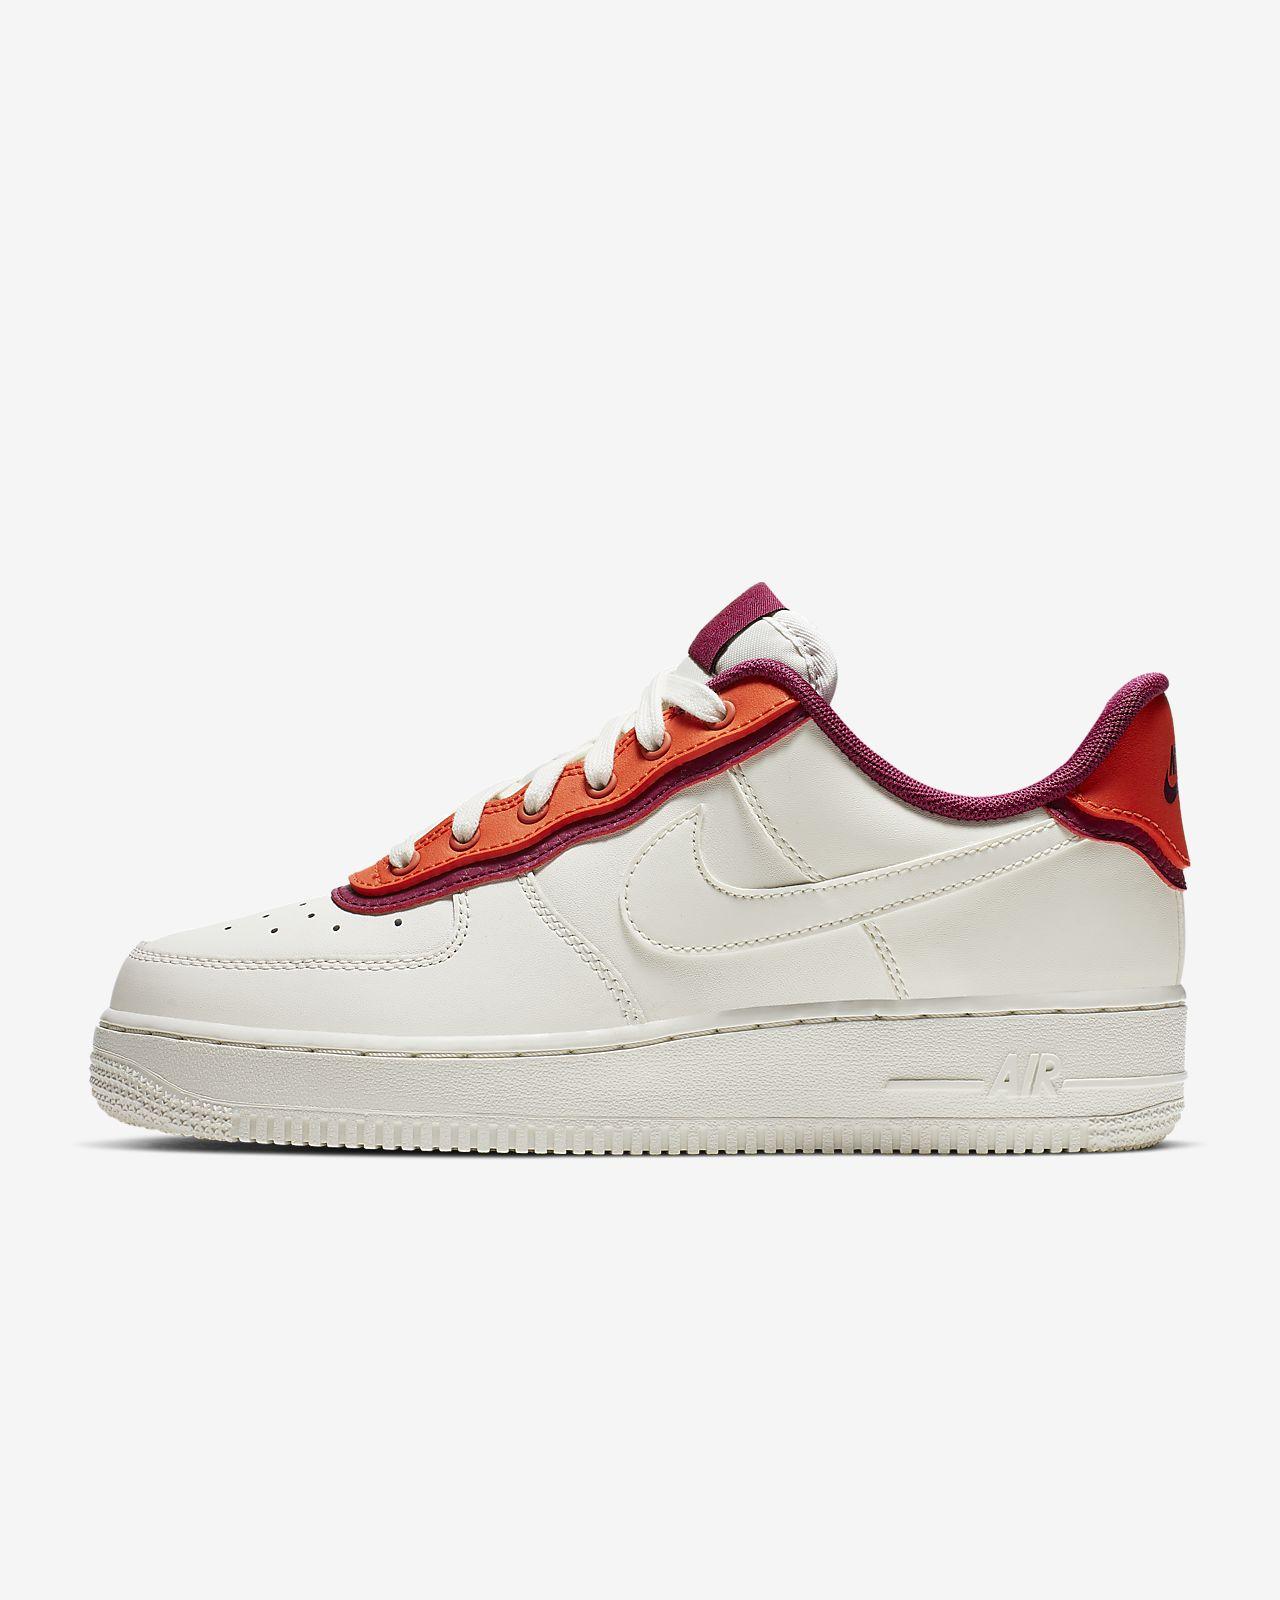 74cf3eea Nike Air Force 1 '07 SE Women's Shoe. Nike.com